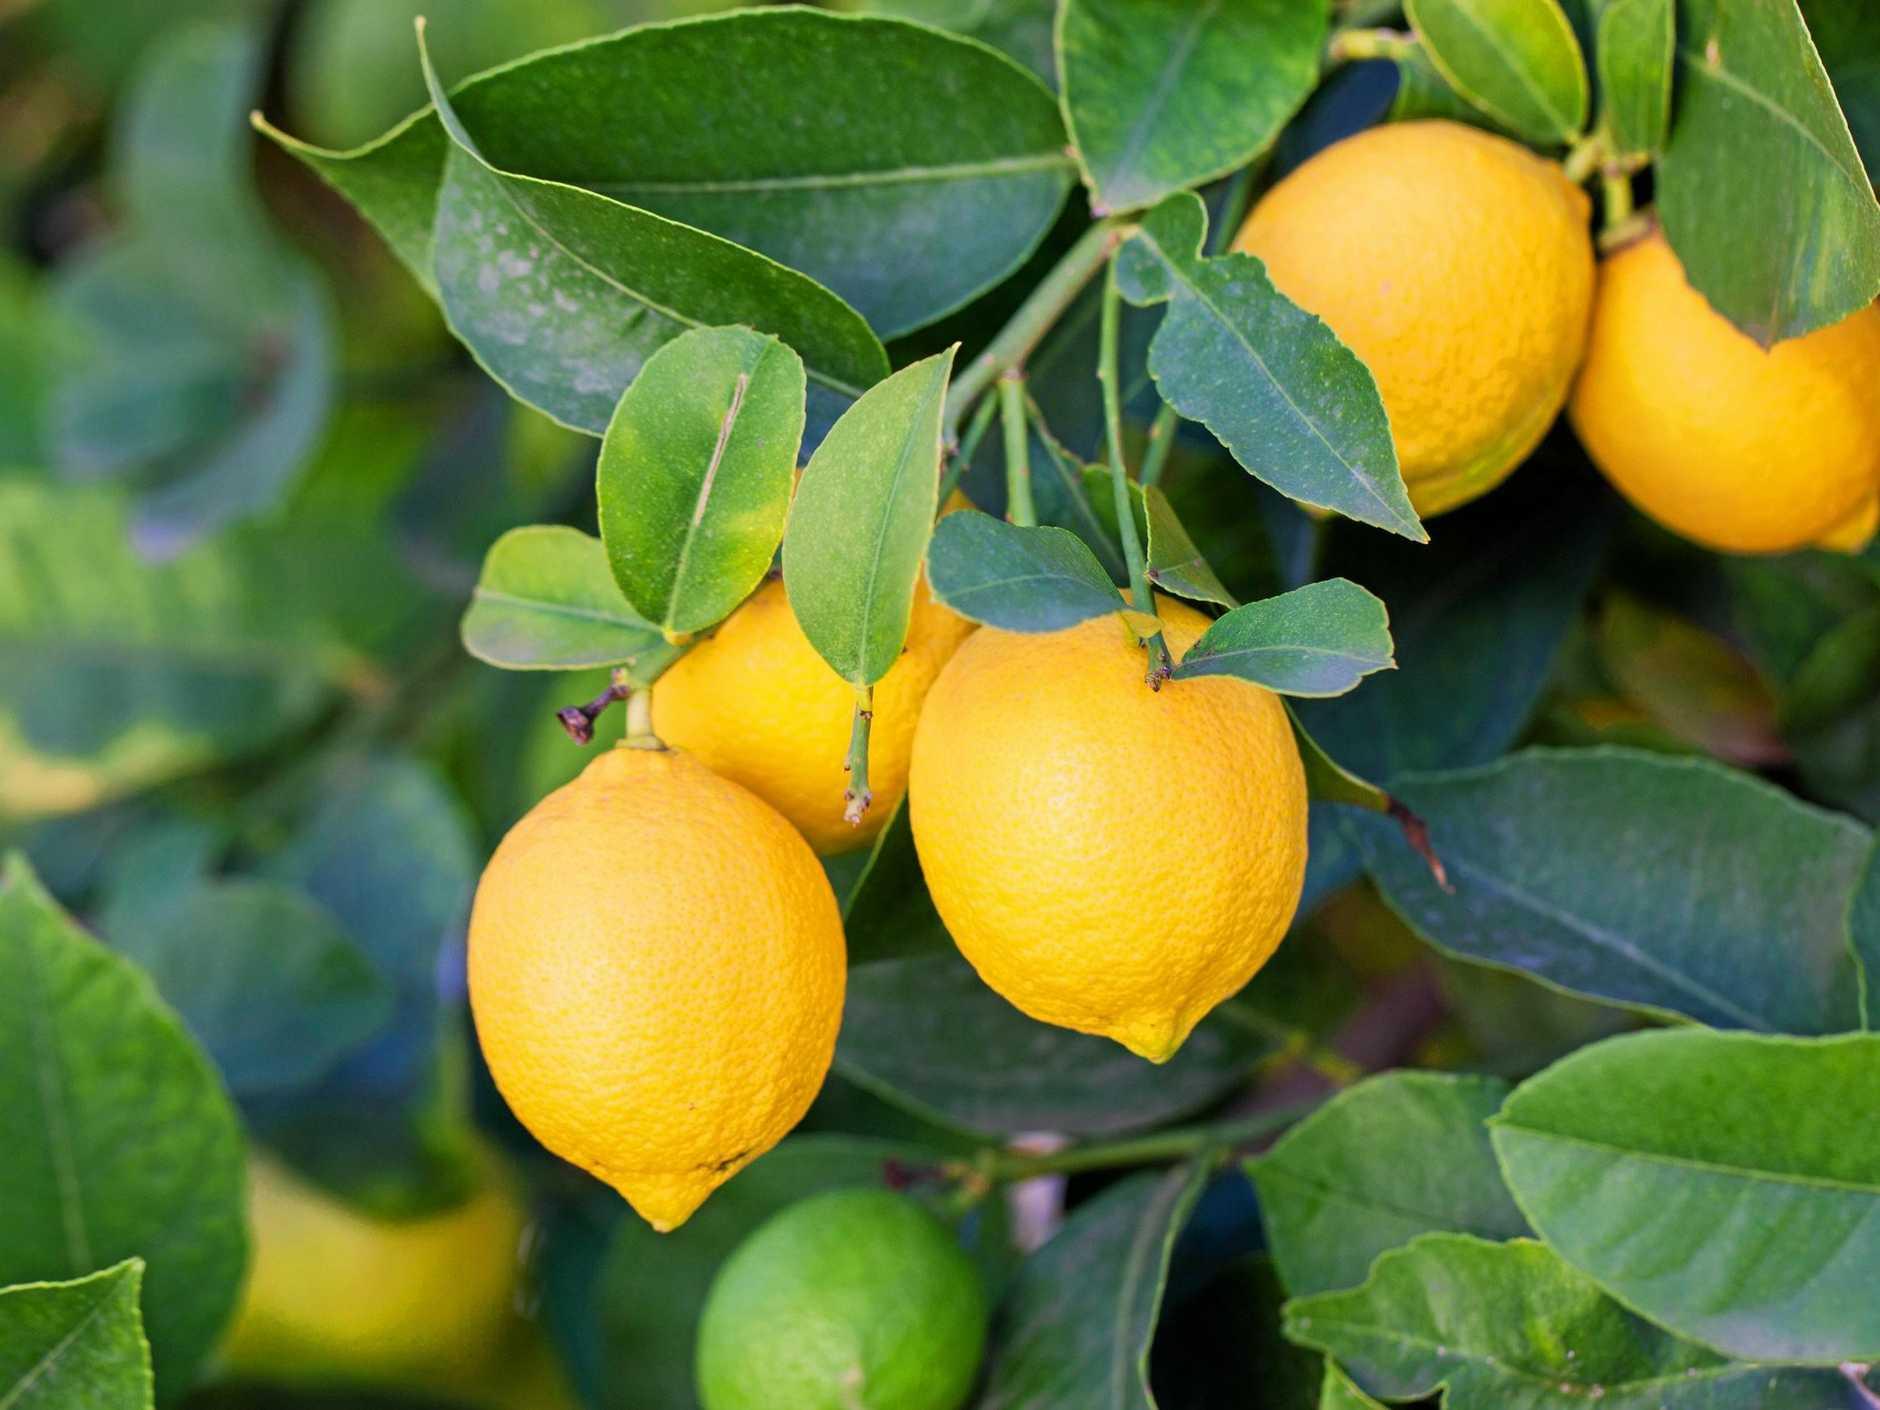 Lemons.